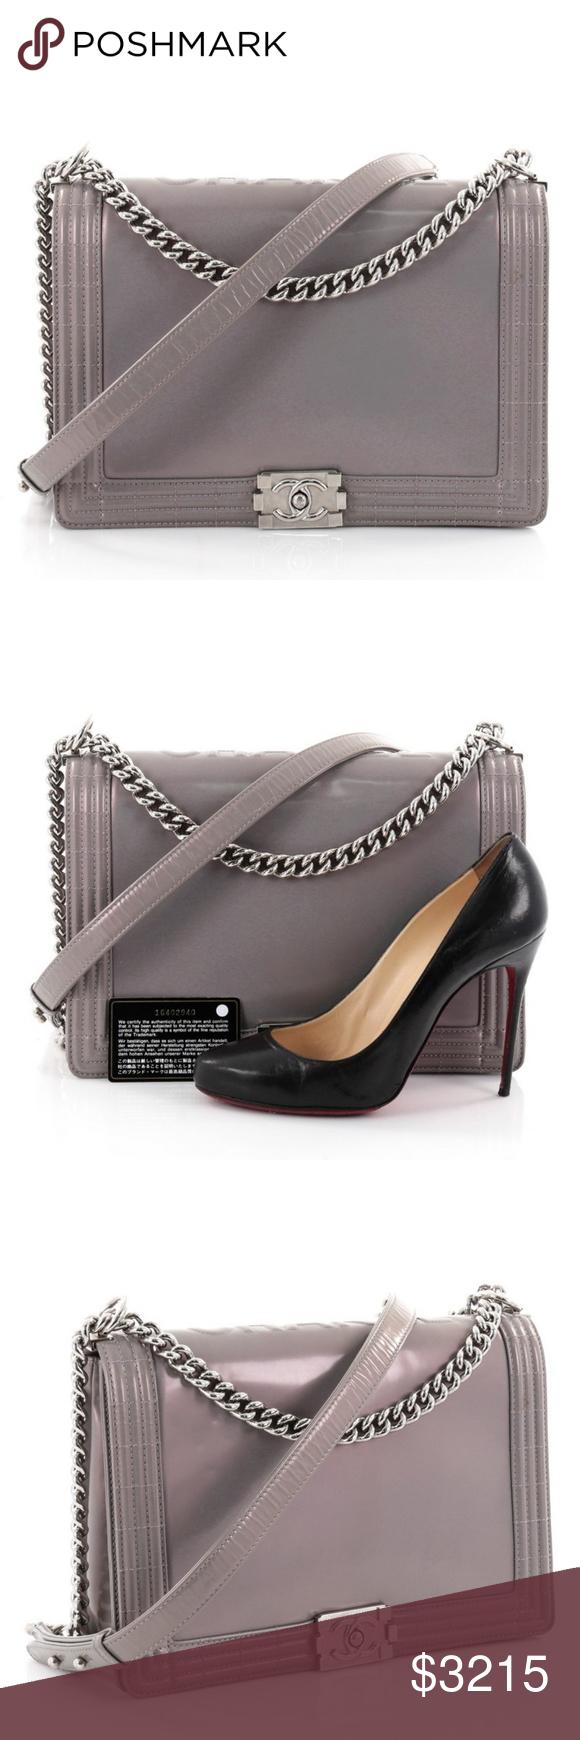 e96ba9303e6706 Chanel Reverso Boy Flap Bag Glazed Calfskin Large Condition: Very good.  Moderate odor,